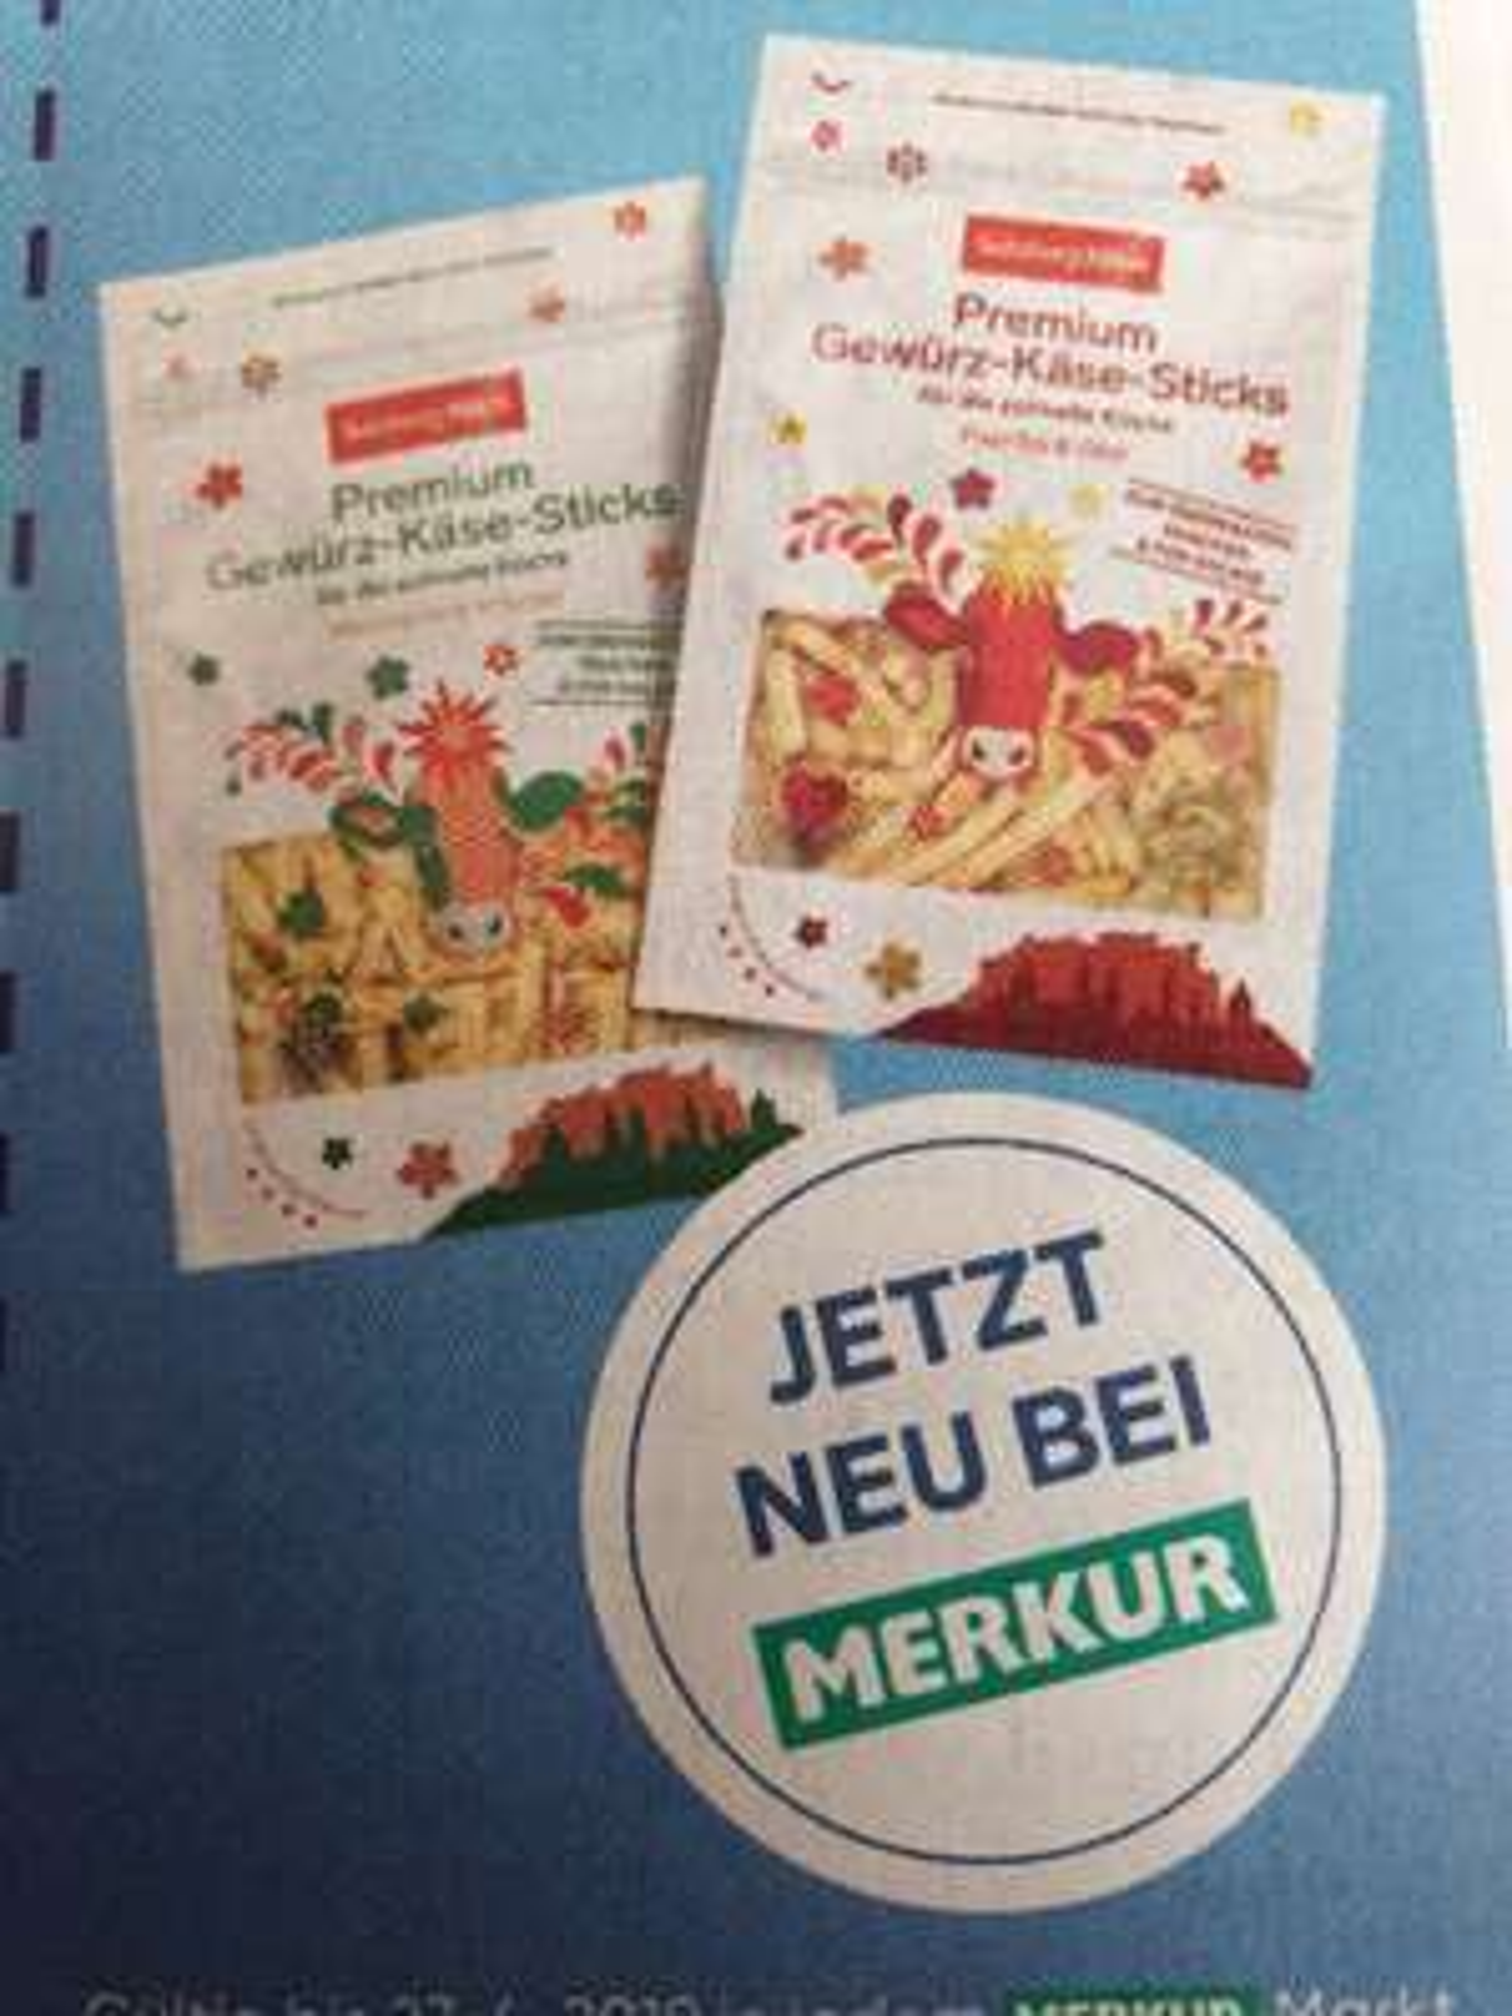 Gratis SalzburgMilch Premium Gewürz-Käse-Sticks beim Merkur